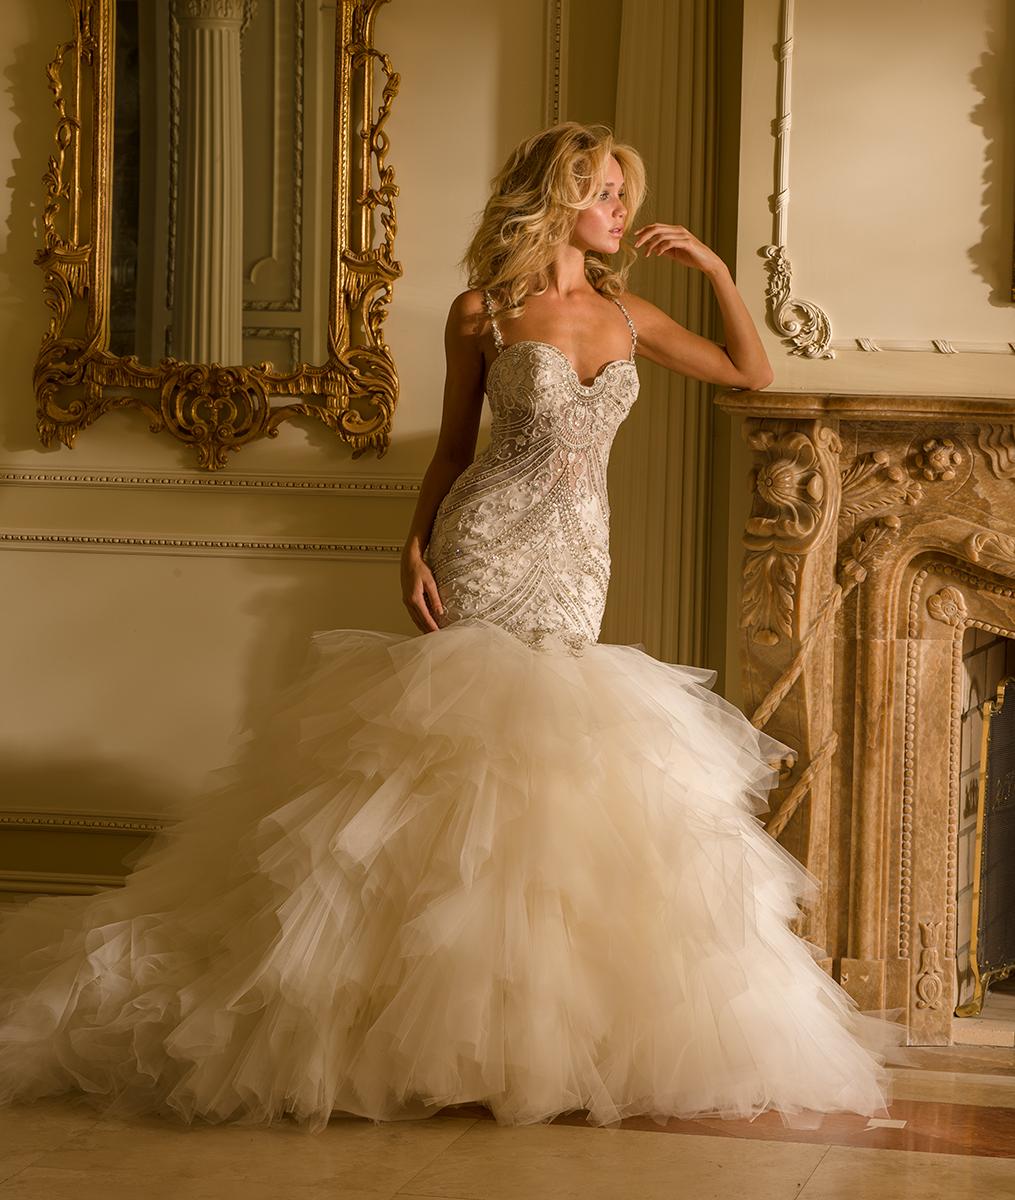 Trumpet Style Wedding Gowns: Wedding Dresses Mermaid Trumpet Style